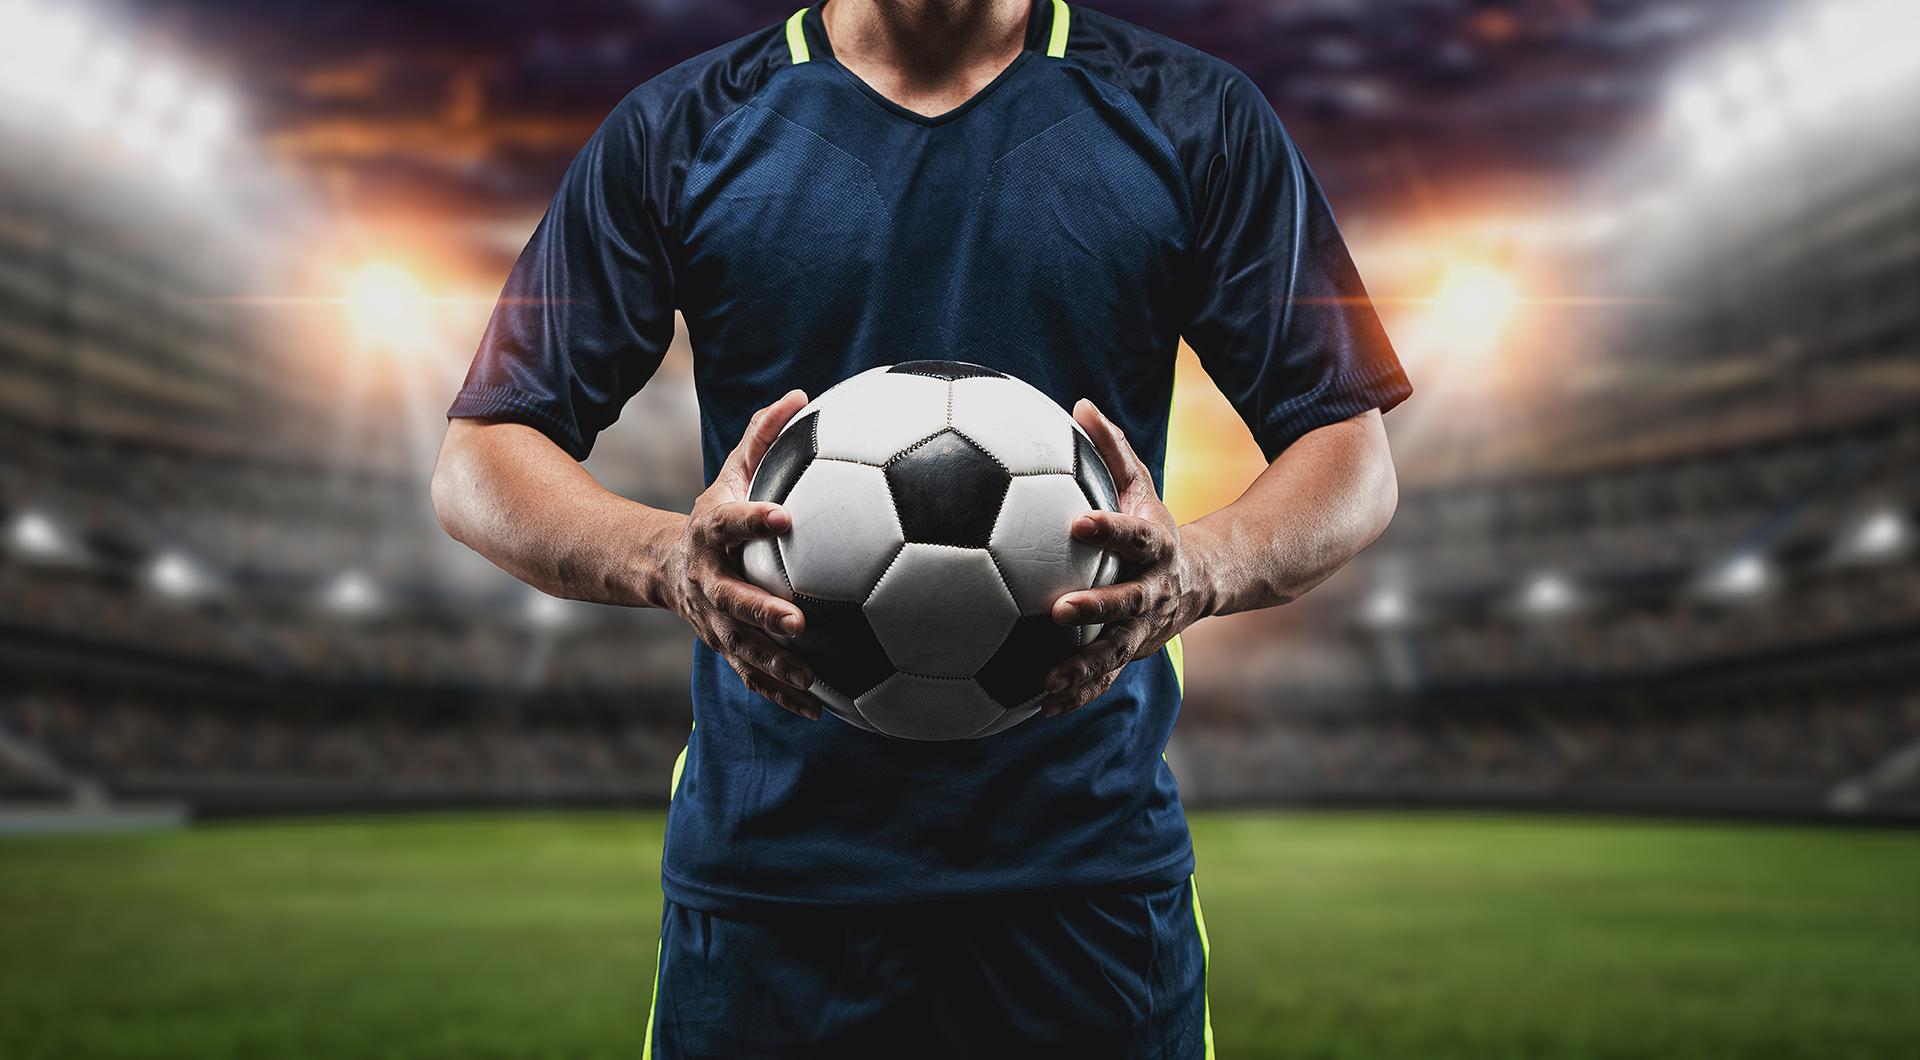 UNIDOS FOOTBALL AGENCY